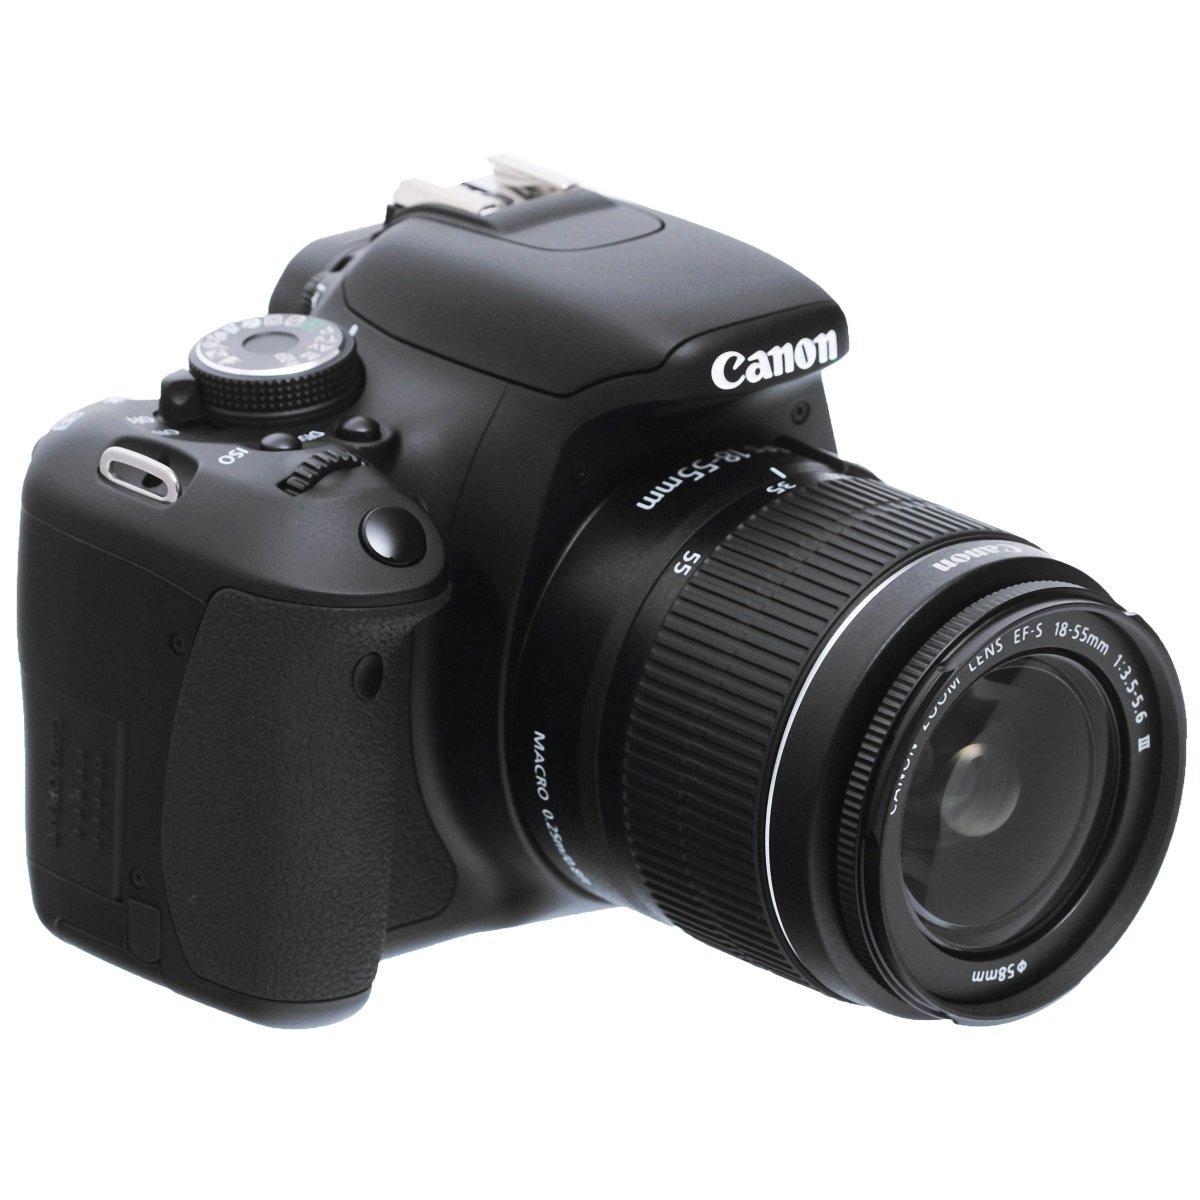 Digitale Spiegelreflexkamera Test